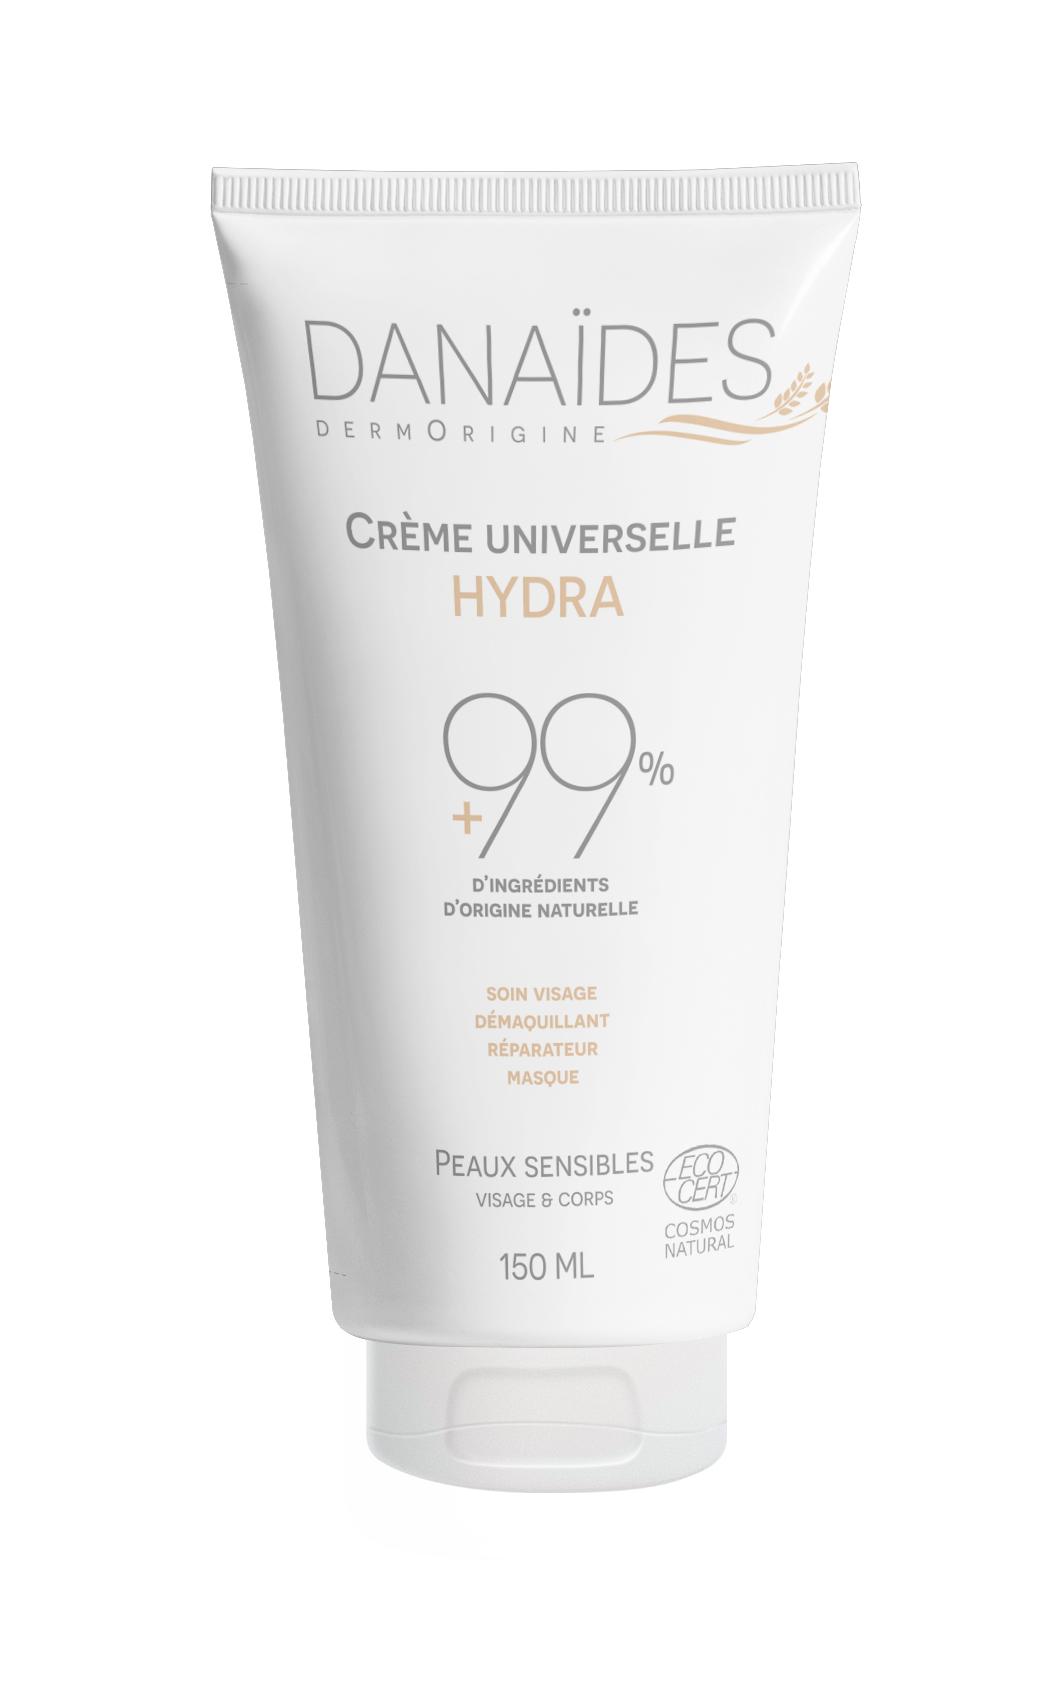 Crème universelle hydra Danaïdes